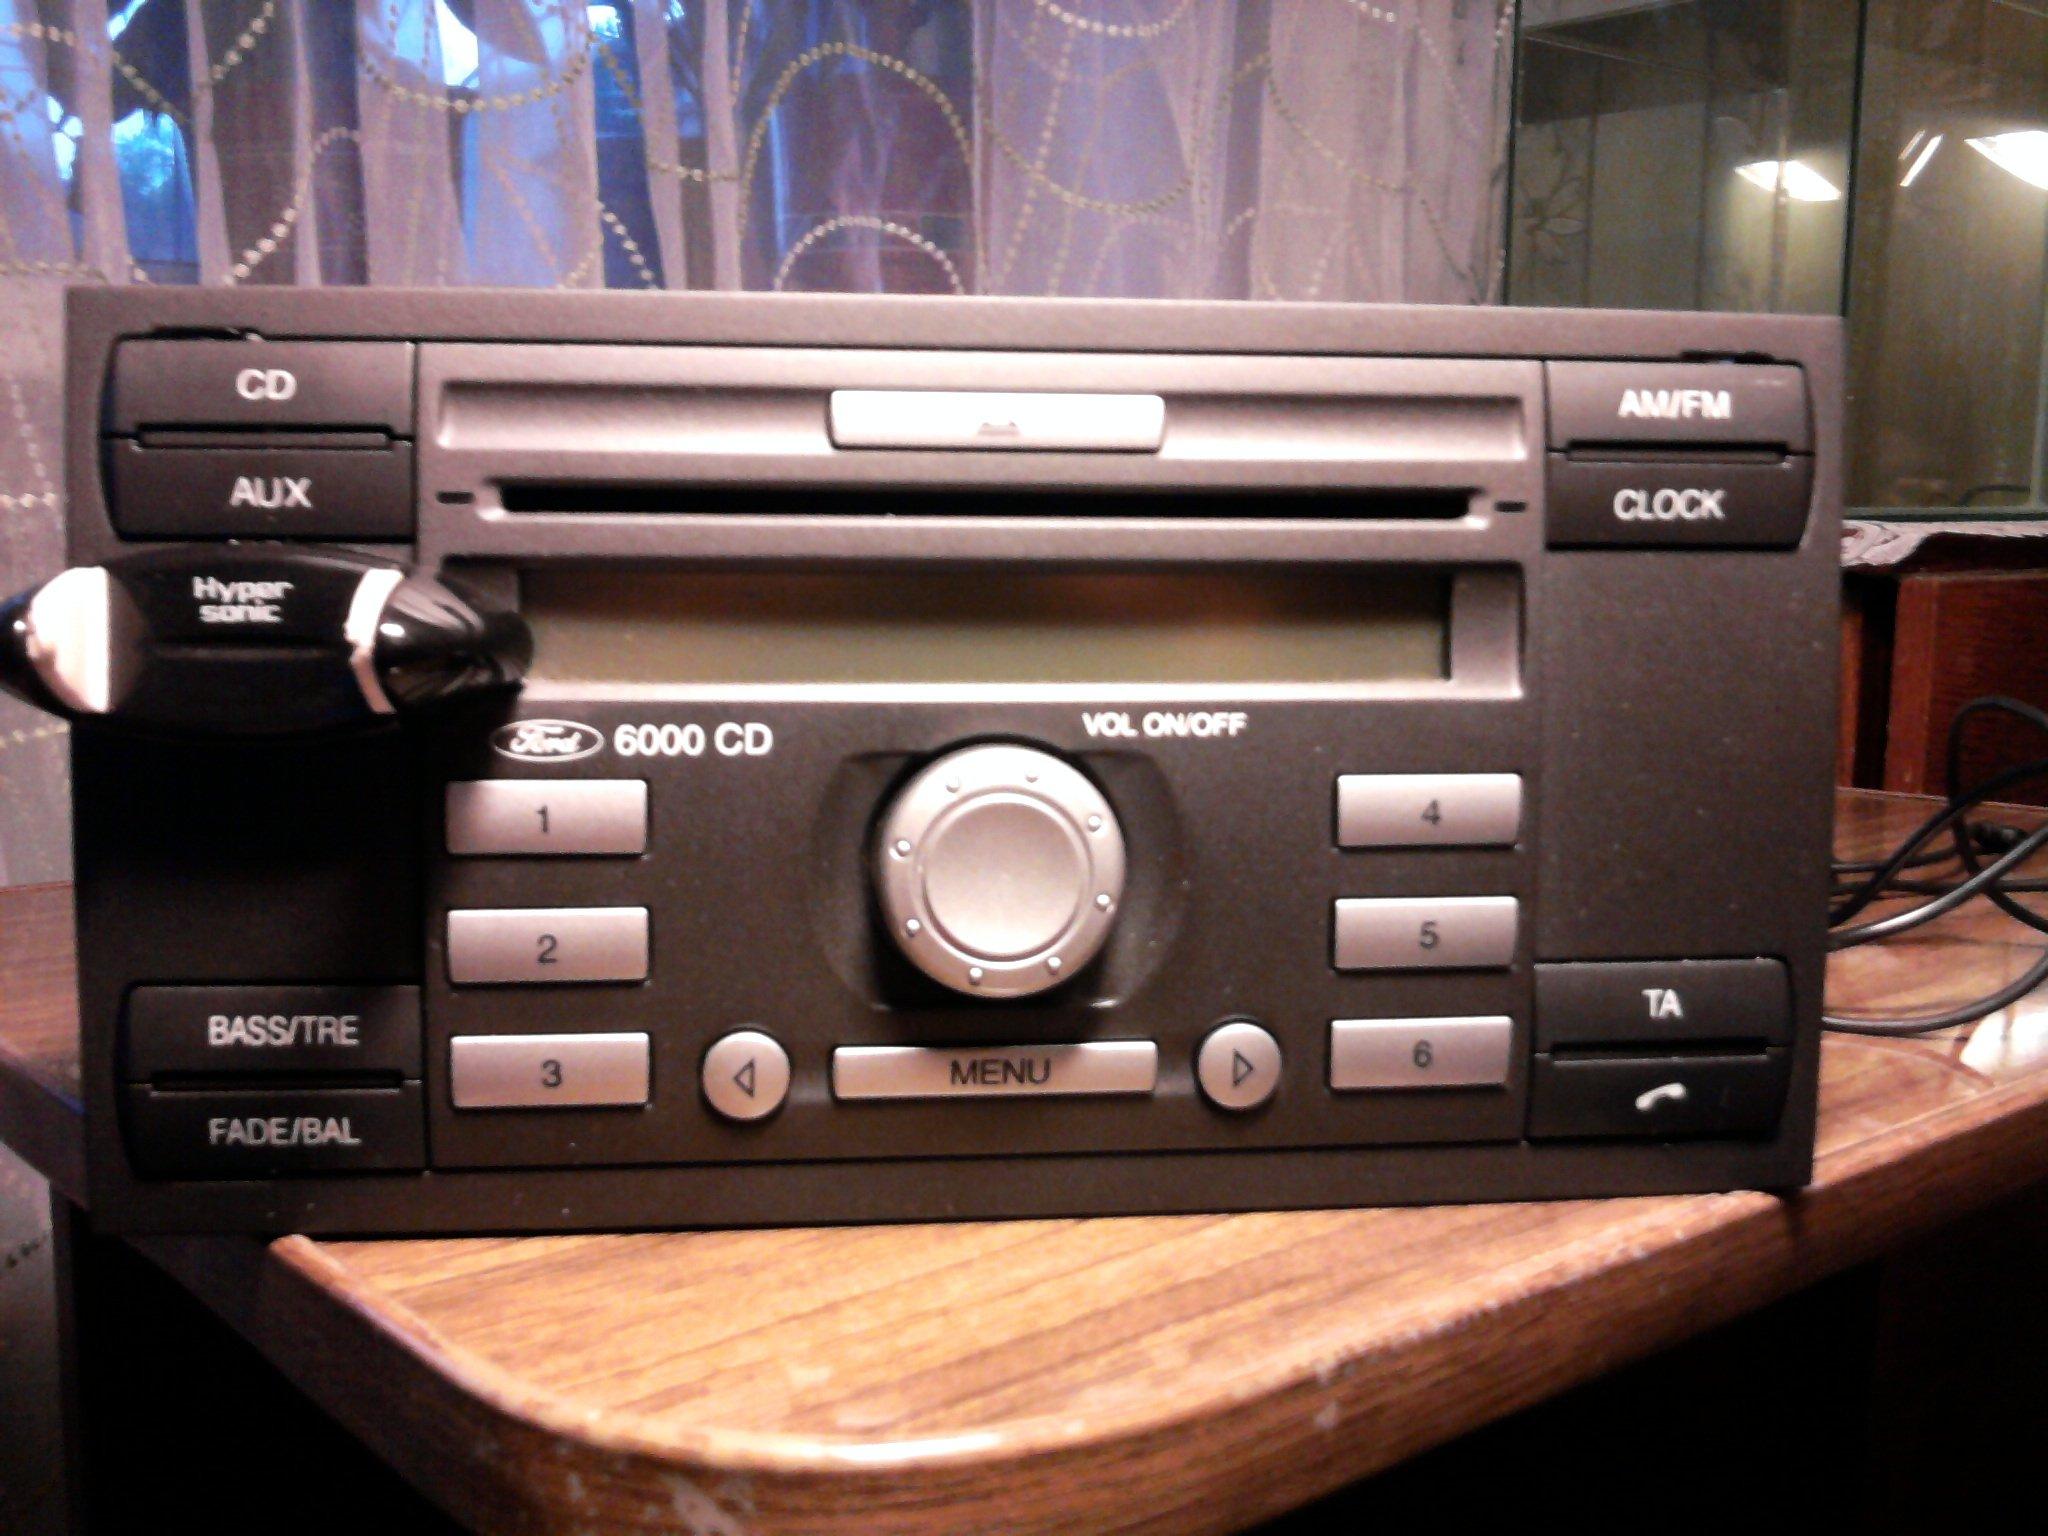 инструкция к магнитоле ford cd 6000